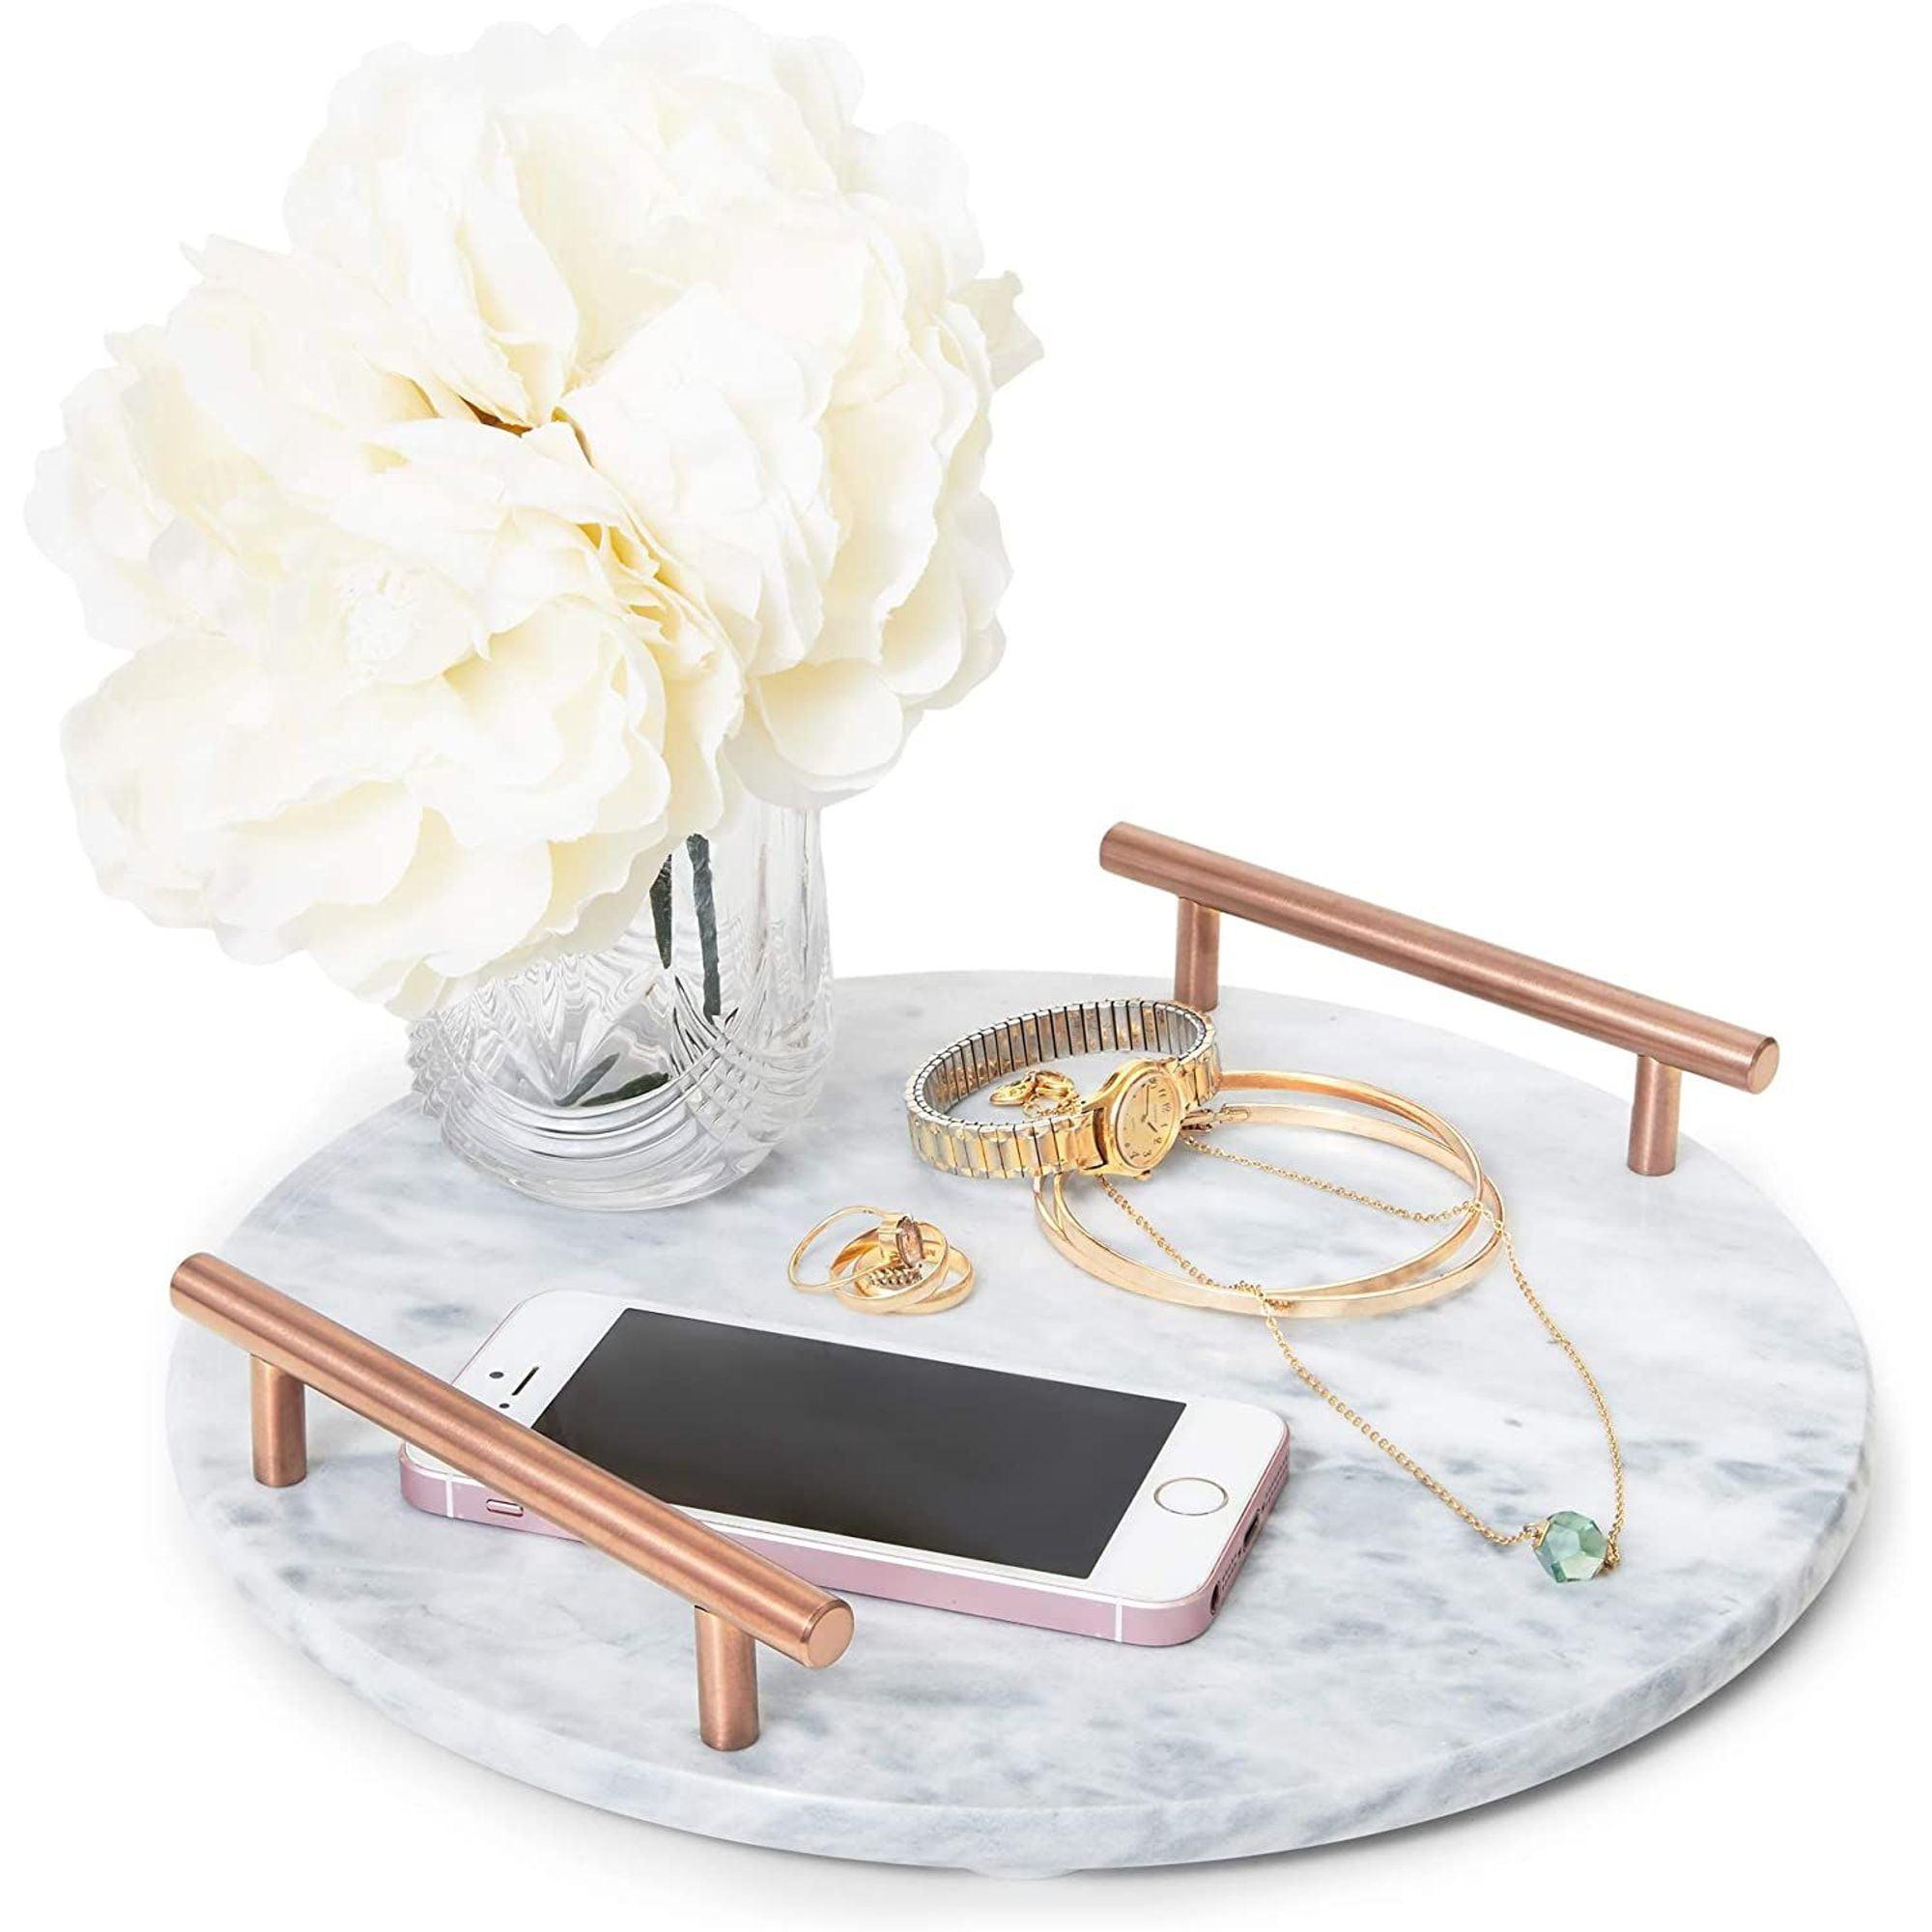 Round Marble Serving Tray Jewelry Trinket Tray Perfume Tray Bathroom Toilet Vanity Tray With Handle White 10 5 X10 5 X0 4 Walmart Com Walmart Com